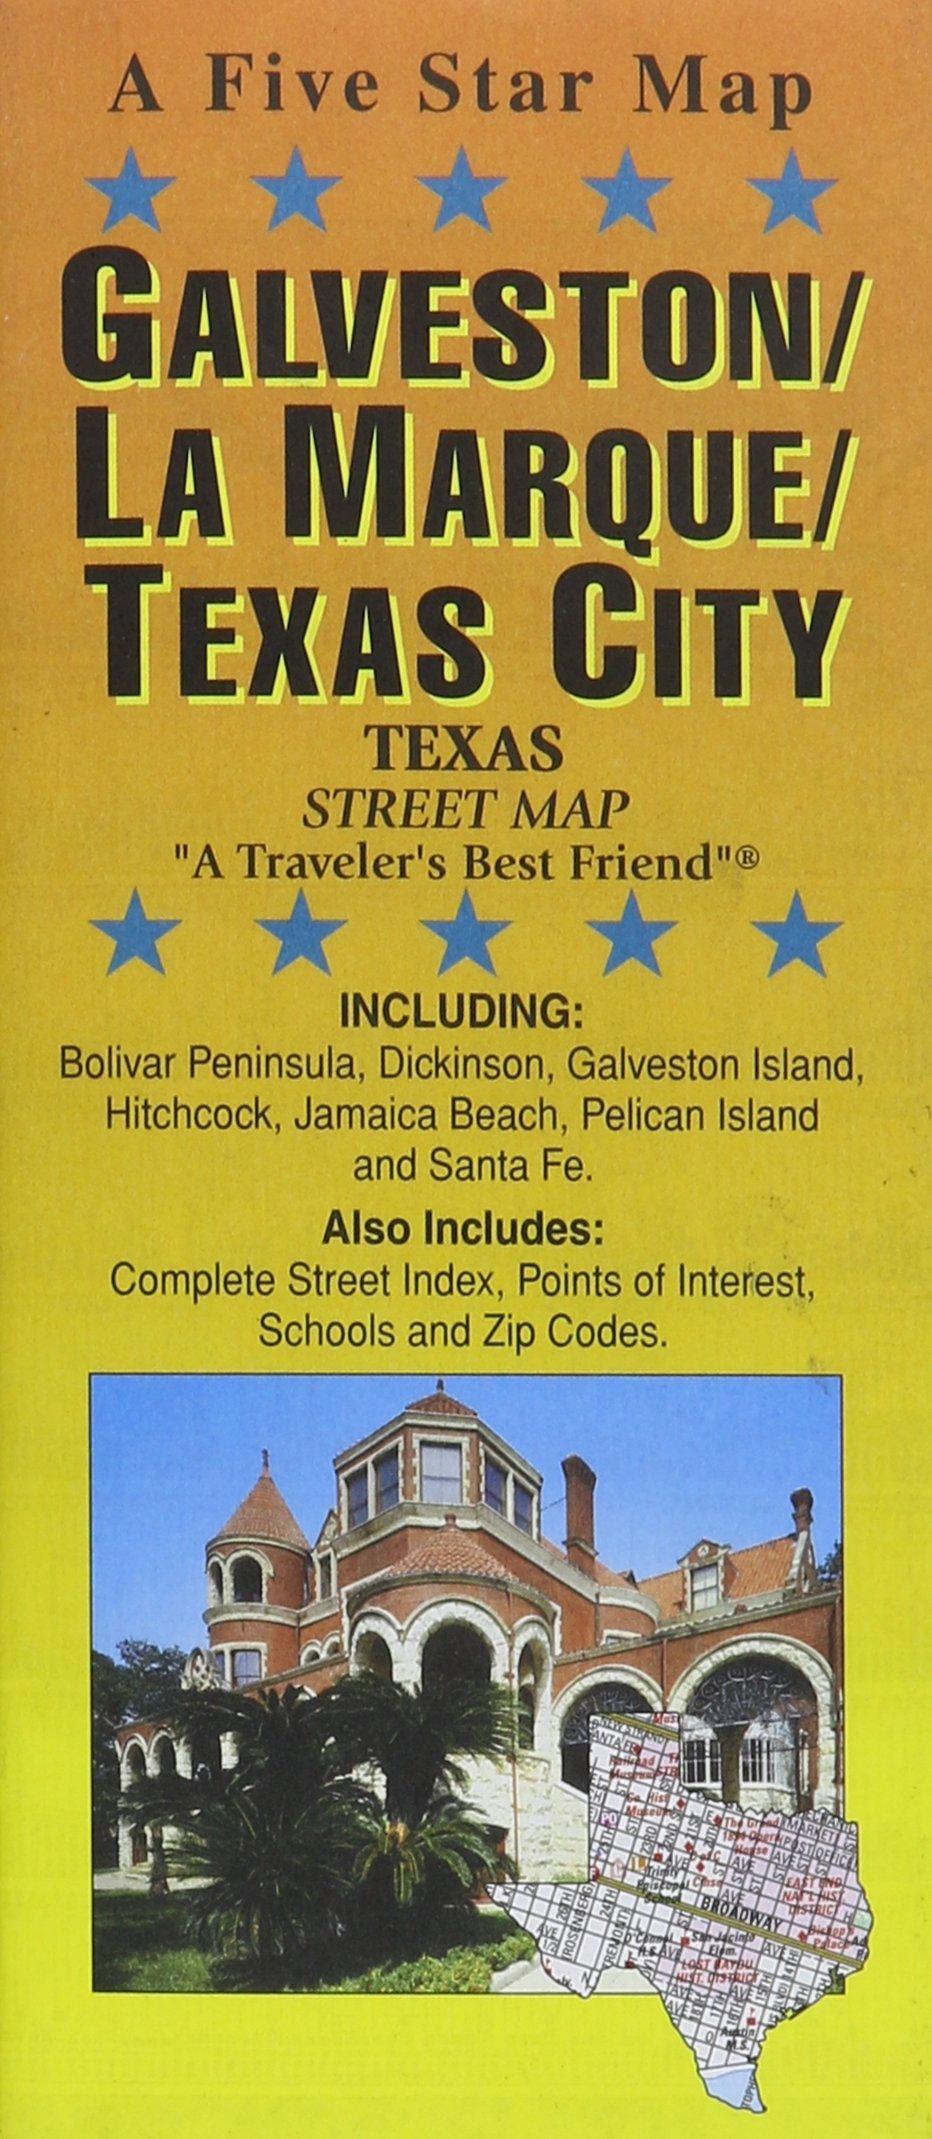 Galveston Map Of Texas.Galveston La Marque Texas City Tx Street Map Five Star Maps